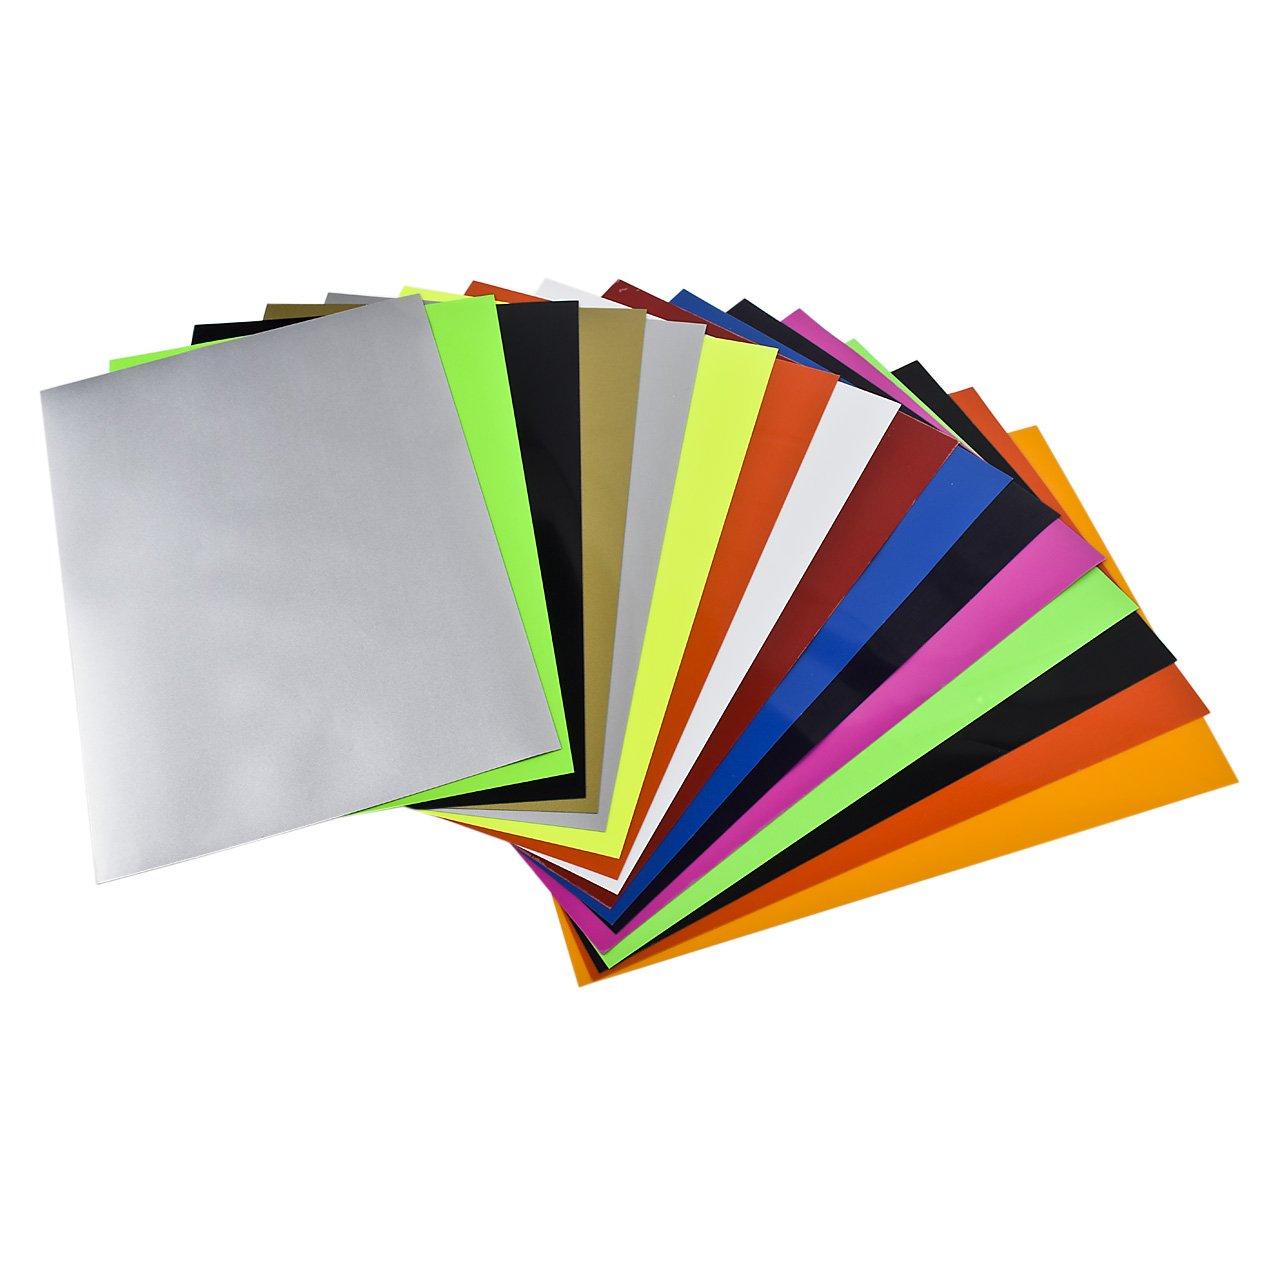 Vinyl sheets for crafts - Newcomdigi Heat Transfer Vinyl Sheets Heat Transfer Vinyl 16pcs For T Shirts Hats Clothing